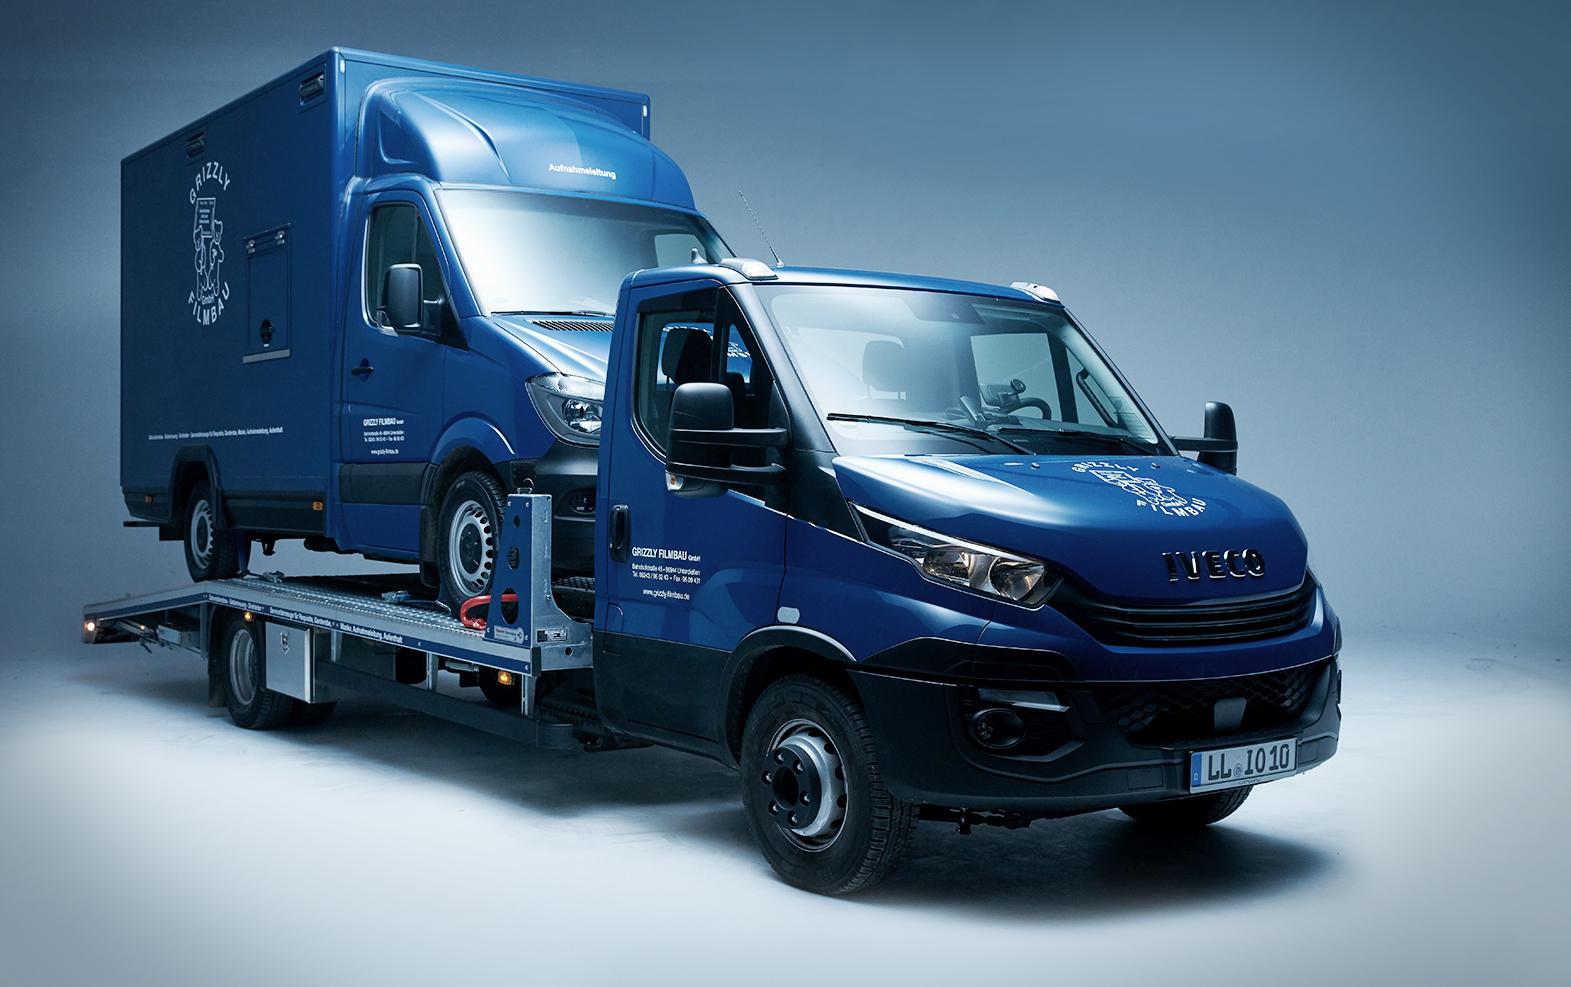 Fahrzeugvorschau_Transporter Kopie